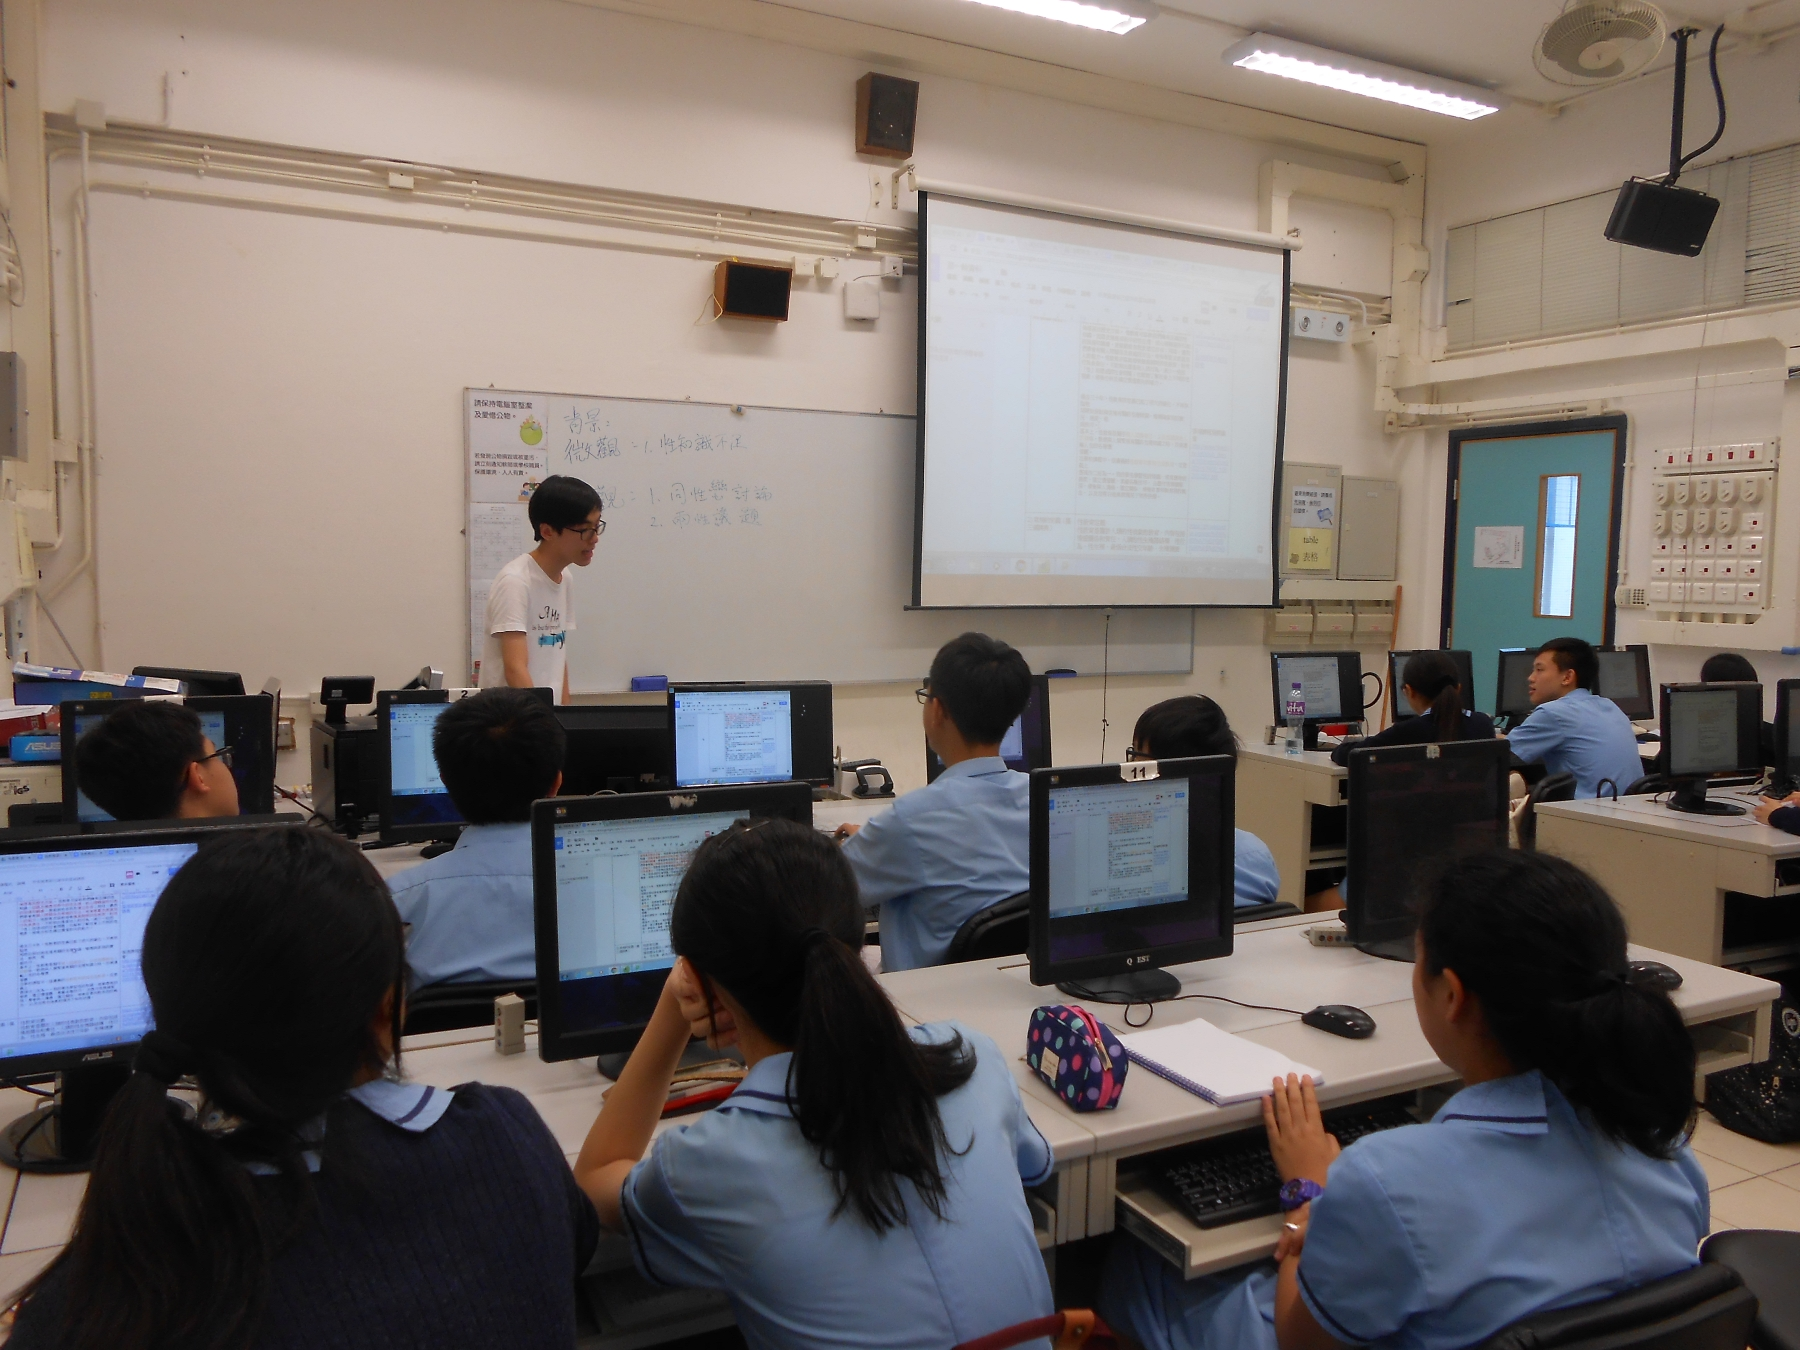 http://www.npc.edu.hk/sites/default/files/dscn0926.jpg